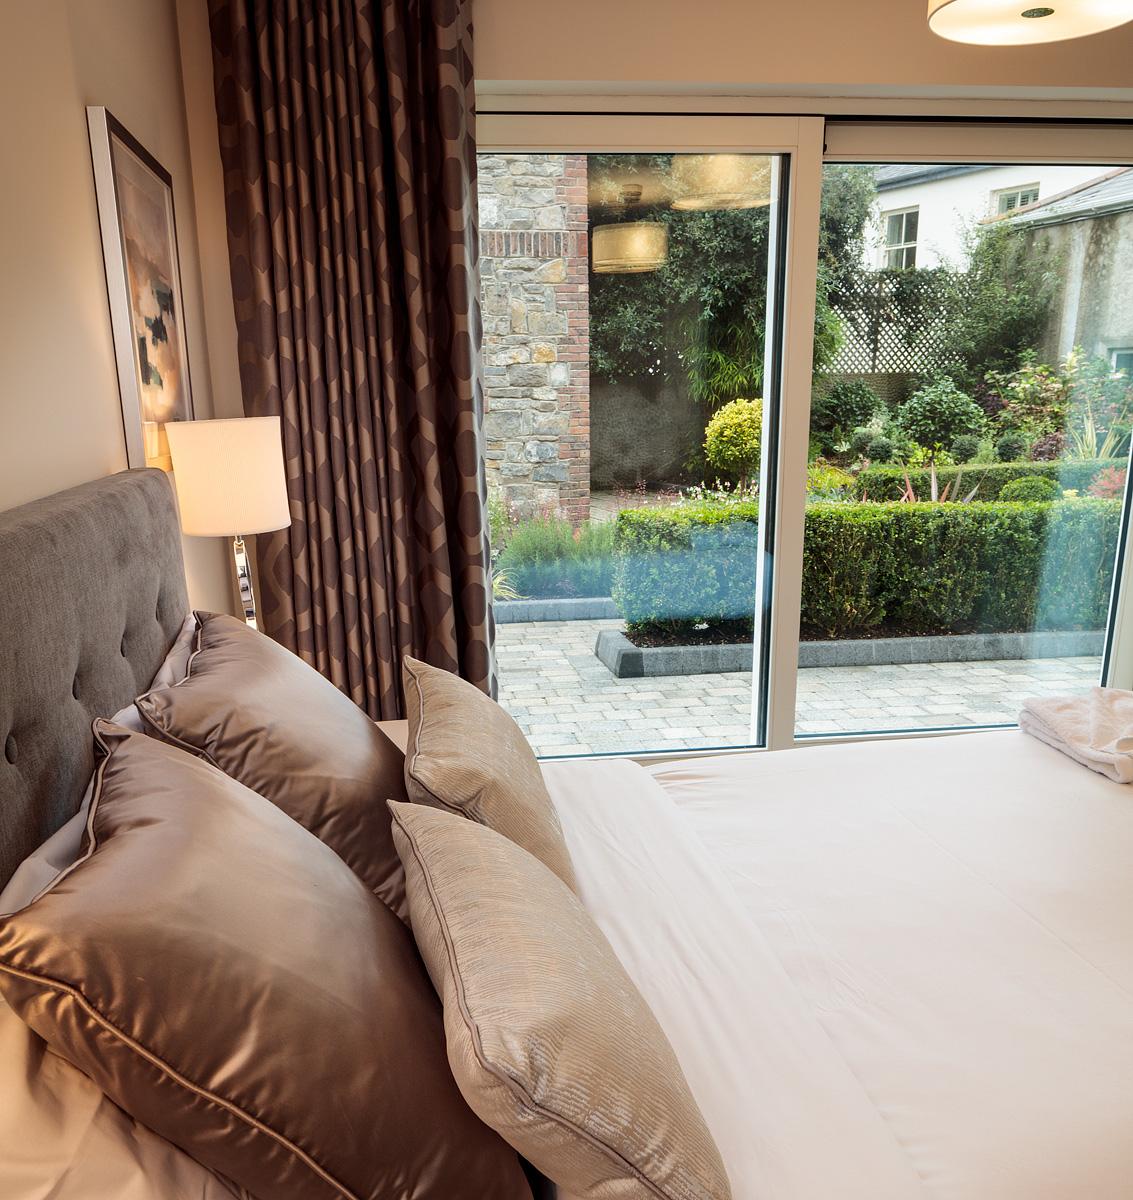 Bedroom doors at Baggot Rath House Apartments, Ballsbridge, Dublin